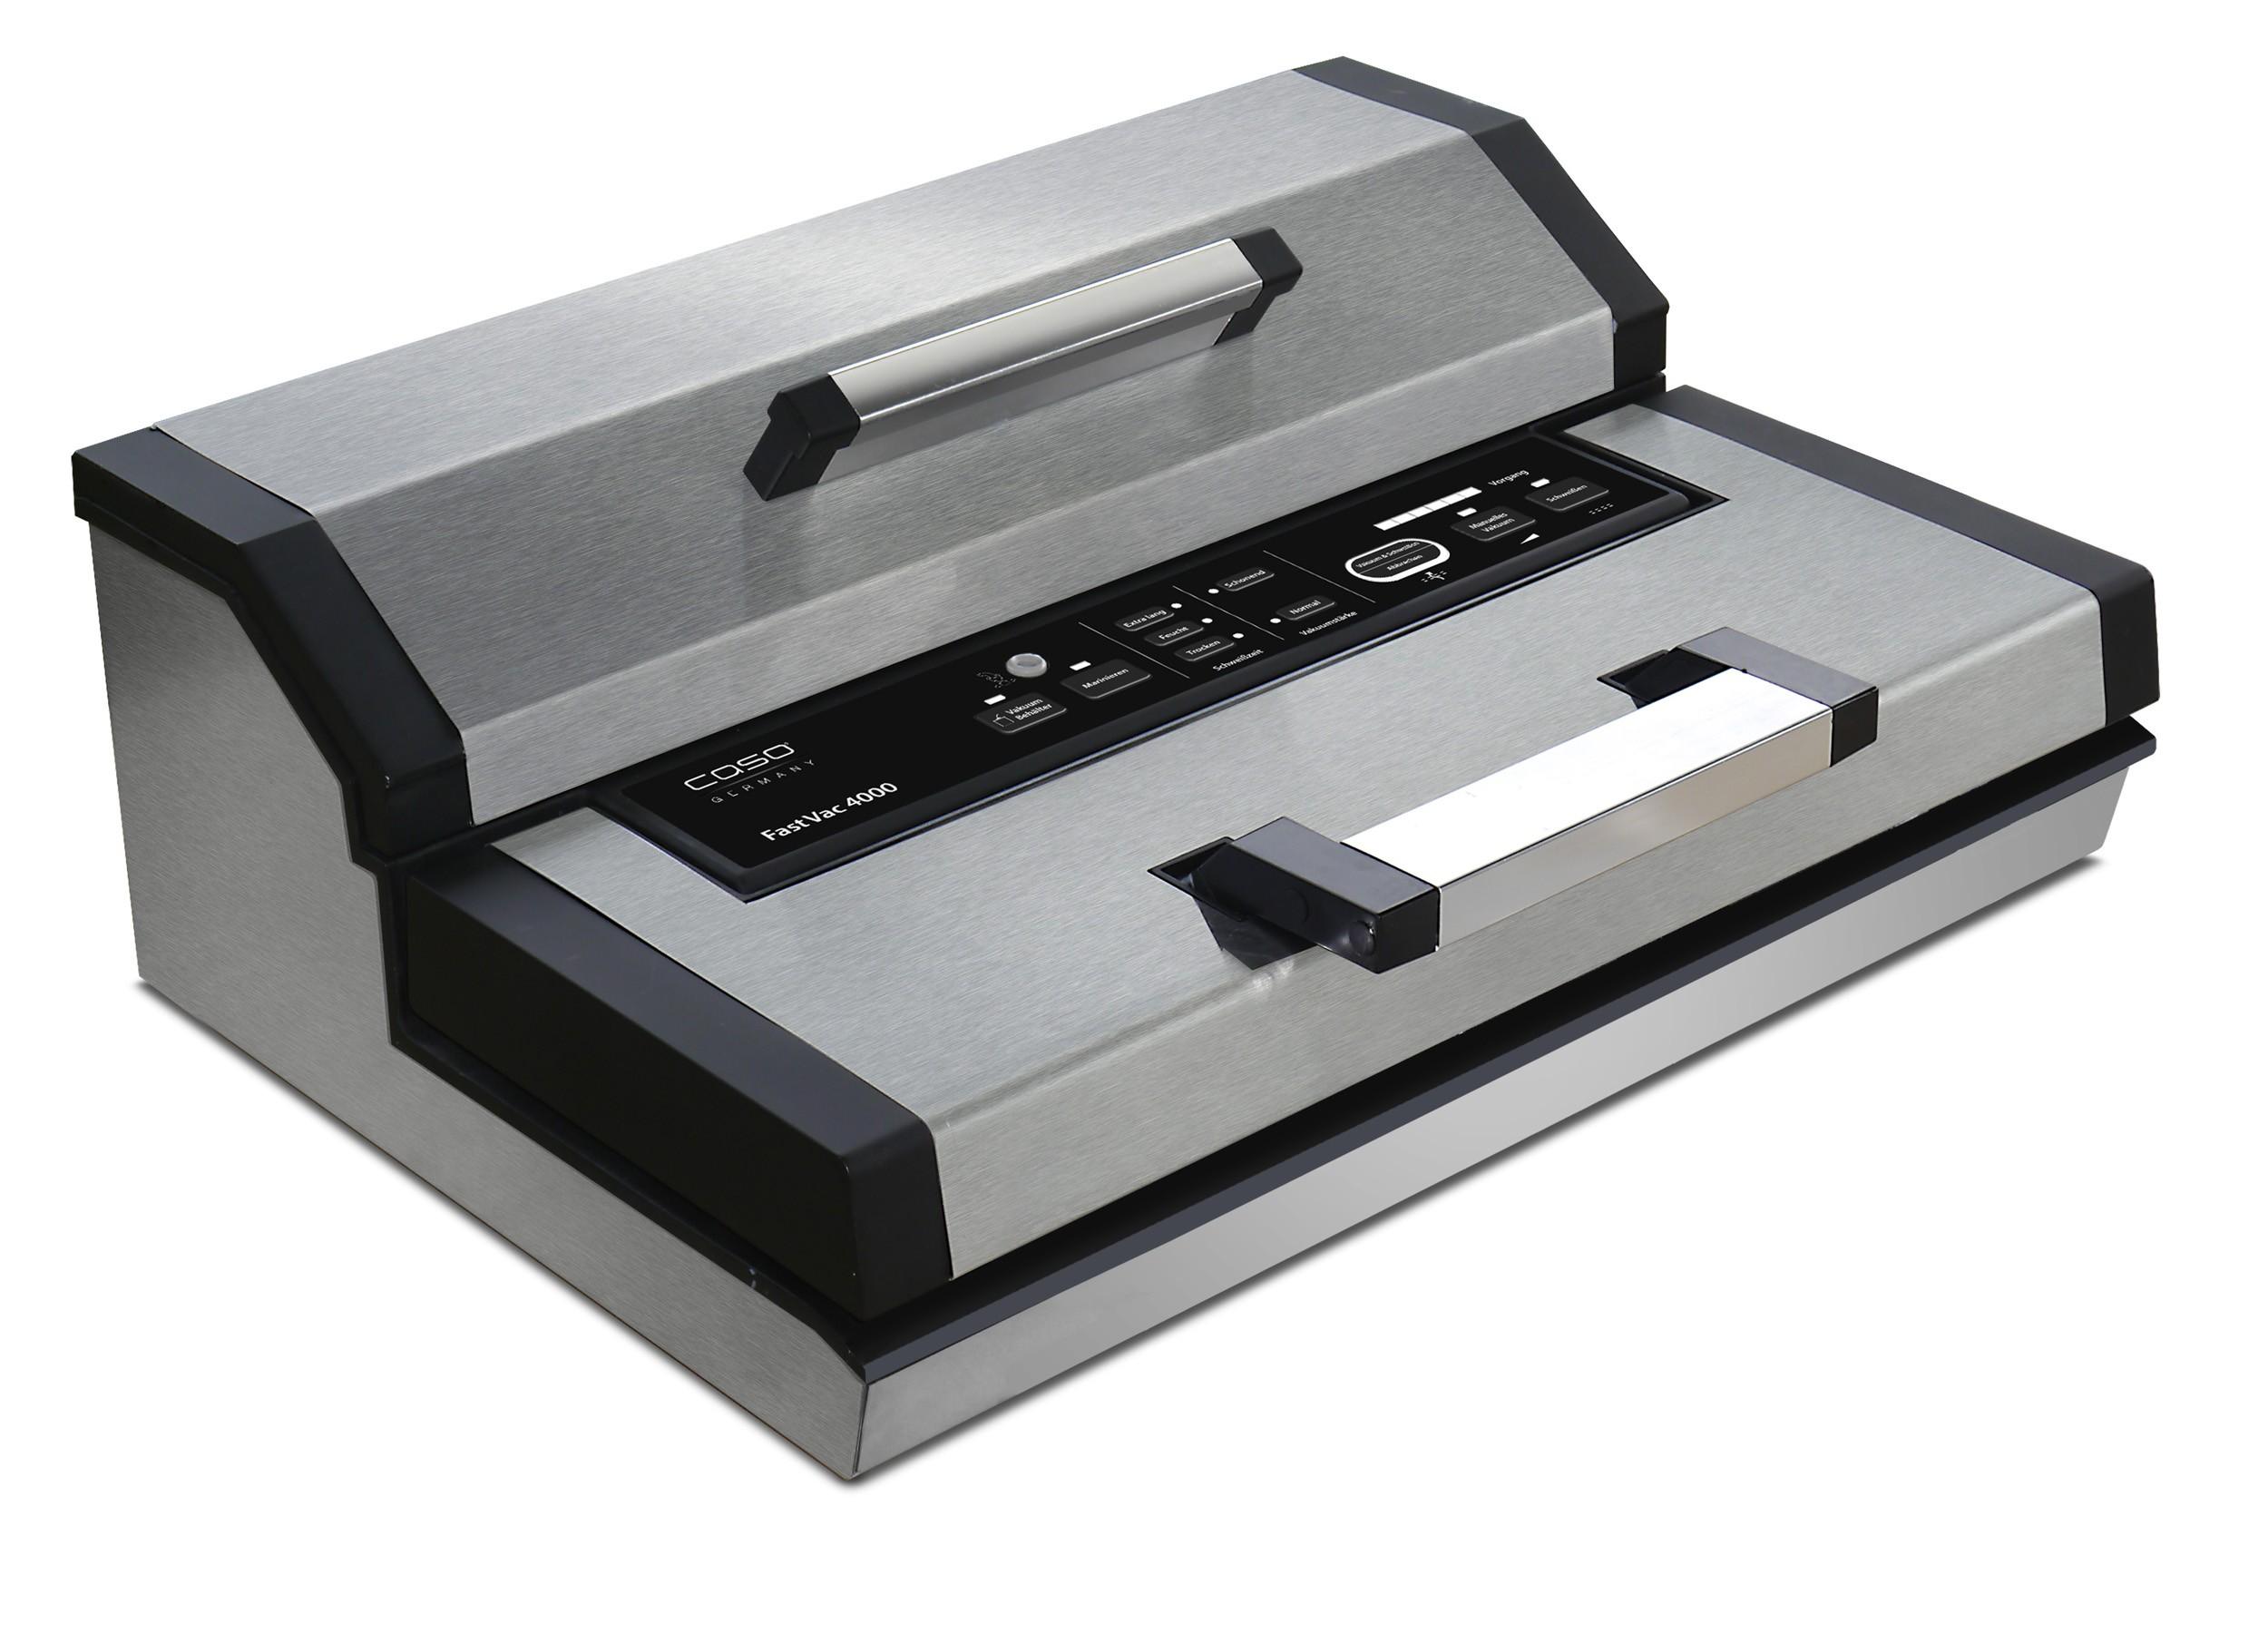 caso gewerbe vakuumierer fastvac 4000 edelstahl homeelectric. Black Bedroom Furniture Sets. Home Design Ideas